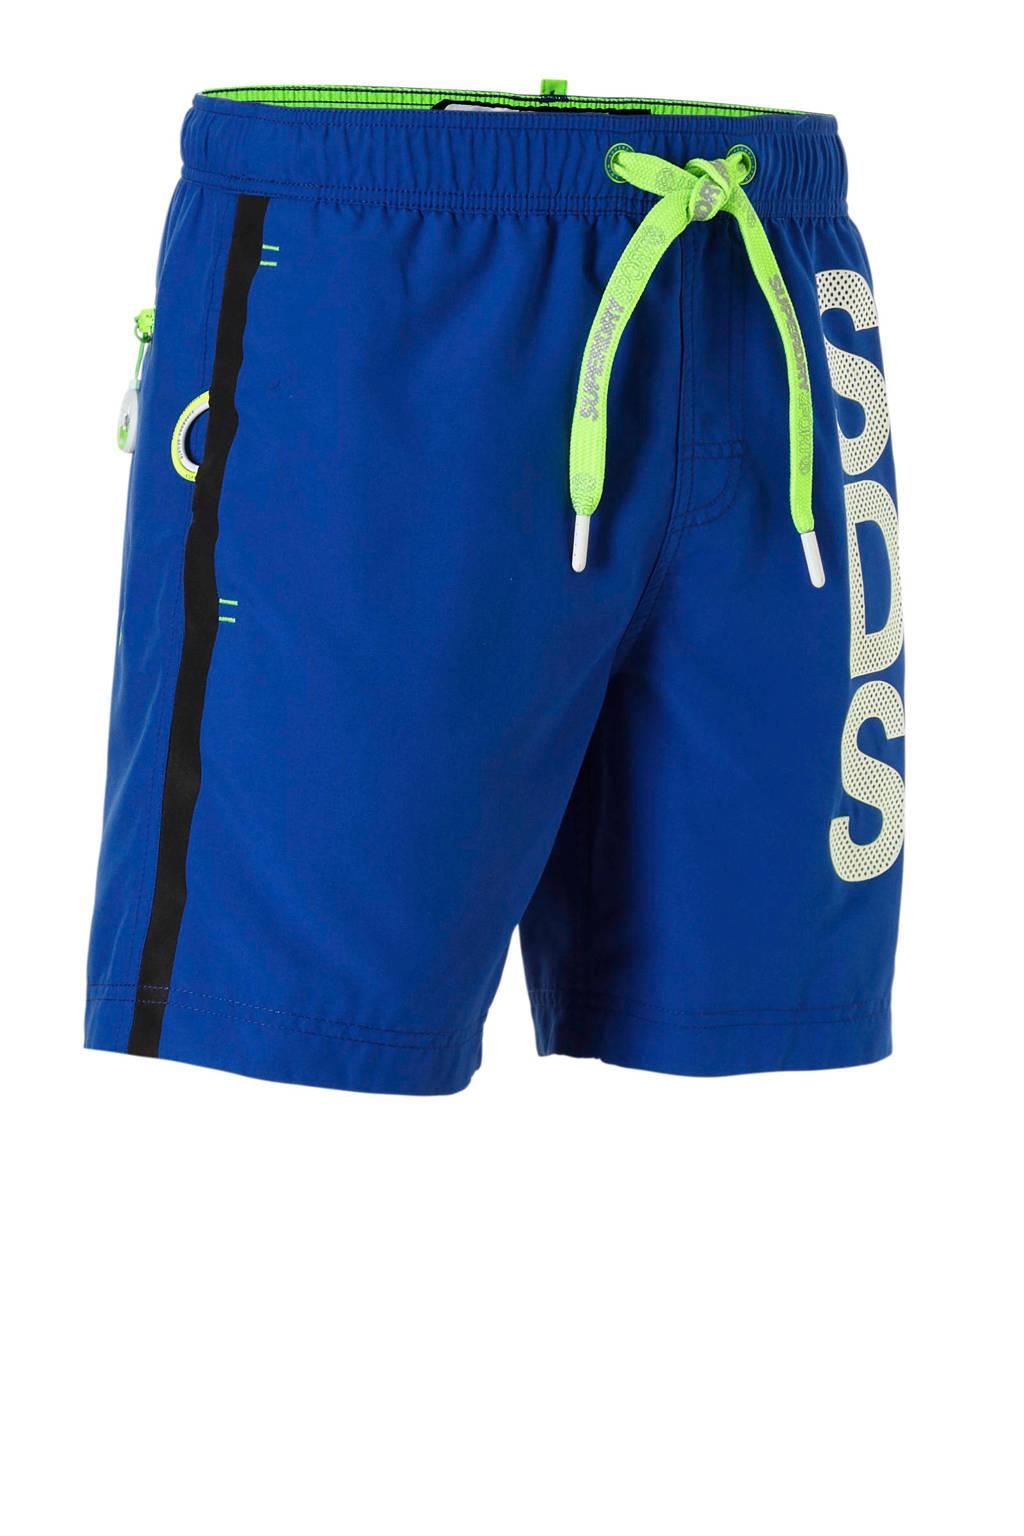 Superdry Sport zwemshort kobalt, Kobalt/groen/wit